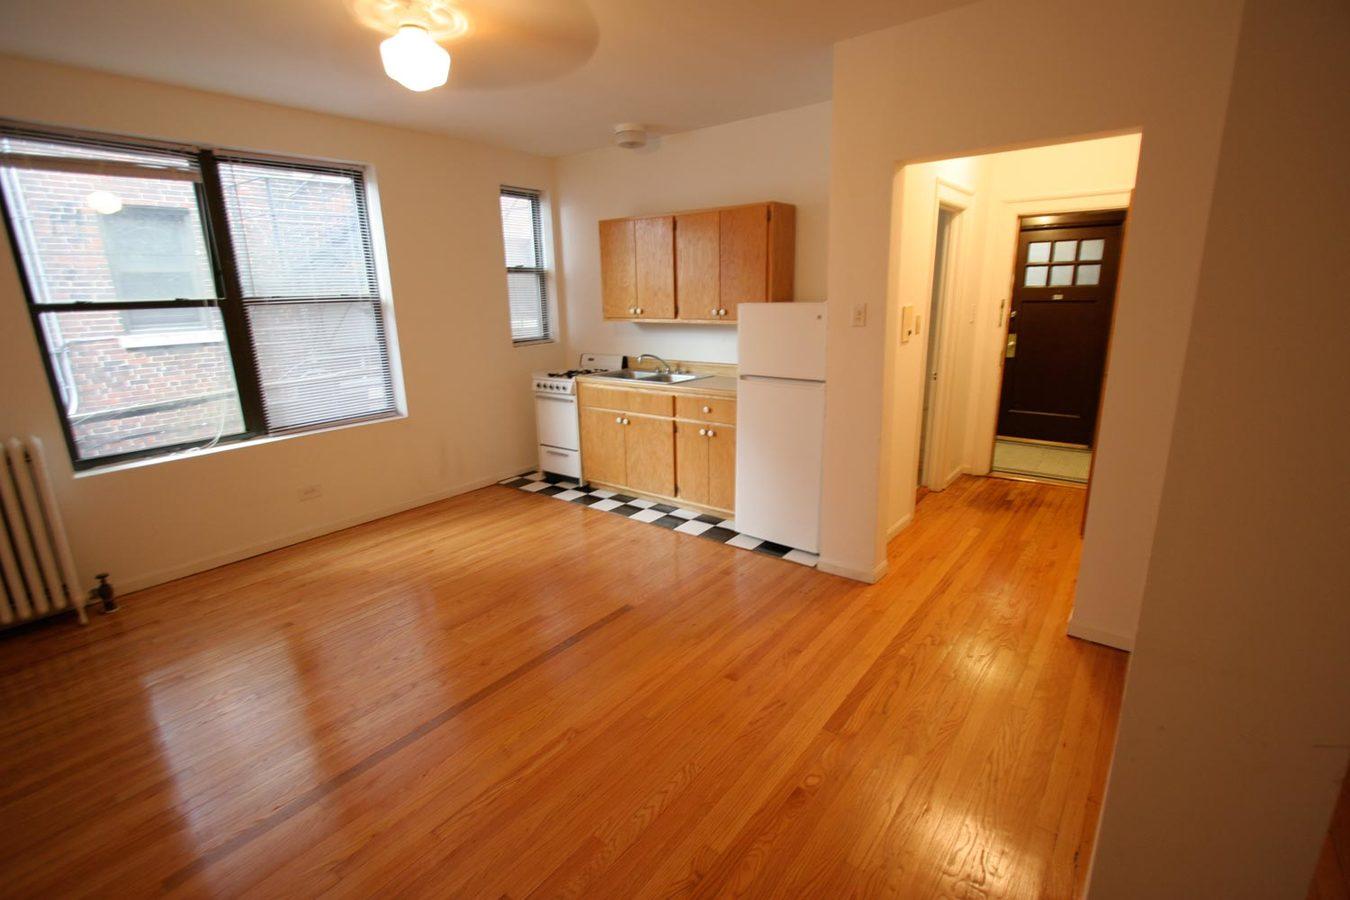 Studio 1 Bathroom Apartment for rent at 5500 S. Cornell Avenue in Chicago, IL